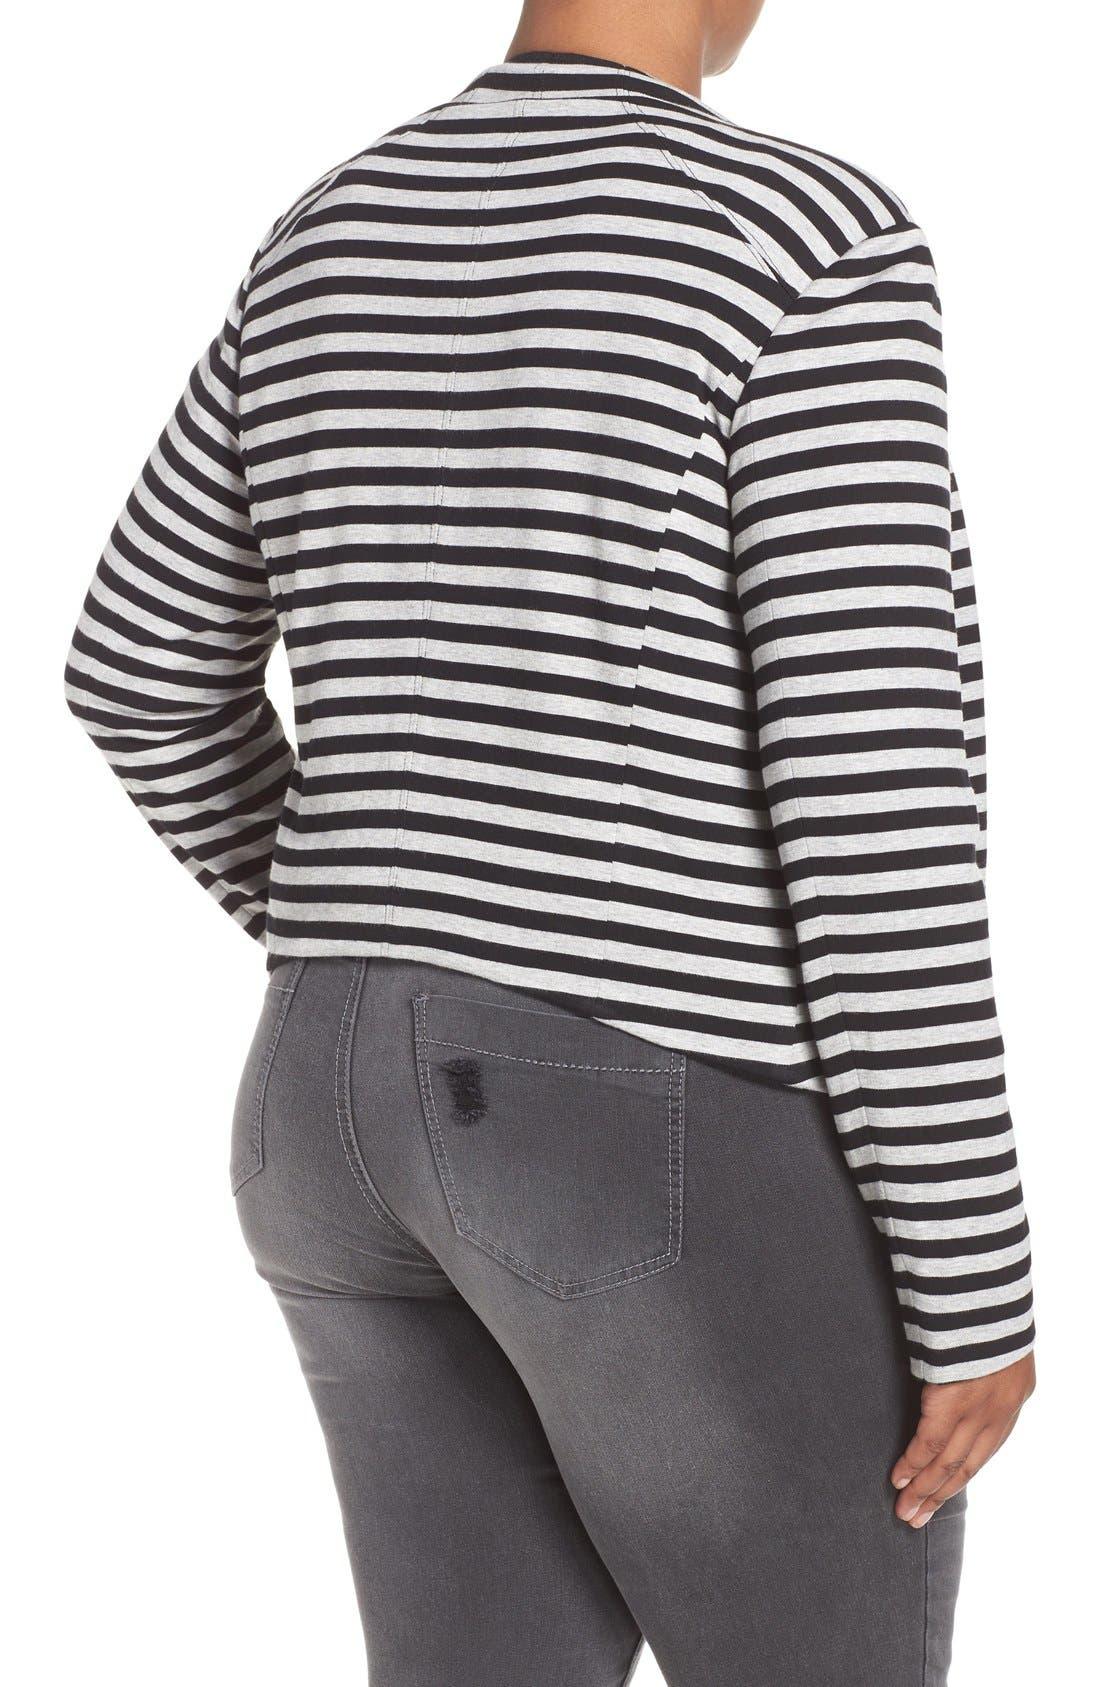 'Veronicka' Stripe Knit Open Front Jacket,                             Alternate thumbnail 2, color,                             BLACK/ HEATHER GREY STRIPE